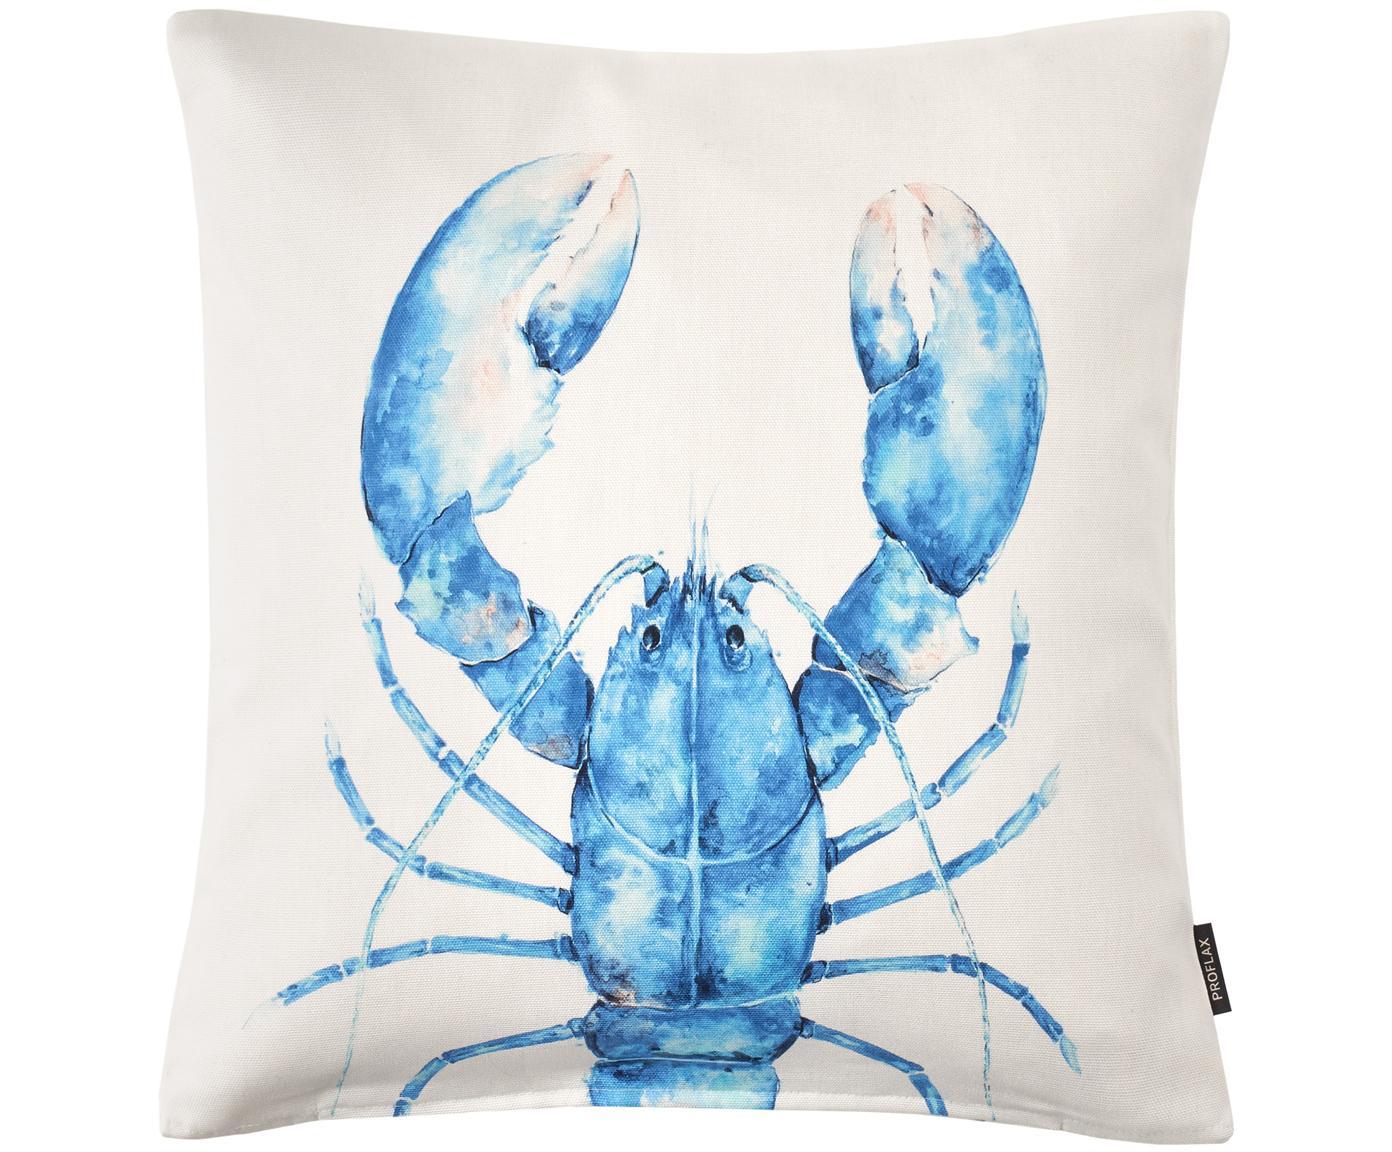 Kissenhülle Lobster mit Hummer in Aquarelloptik, Baumwolle, Weiß, Blau, 40 x 40 cm